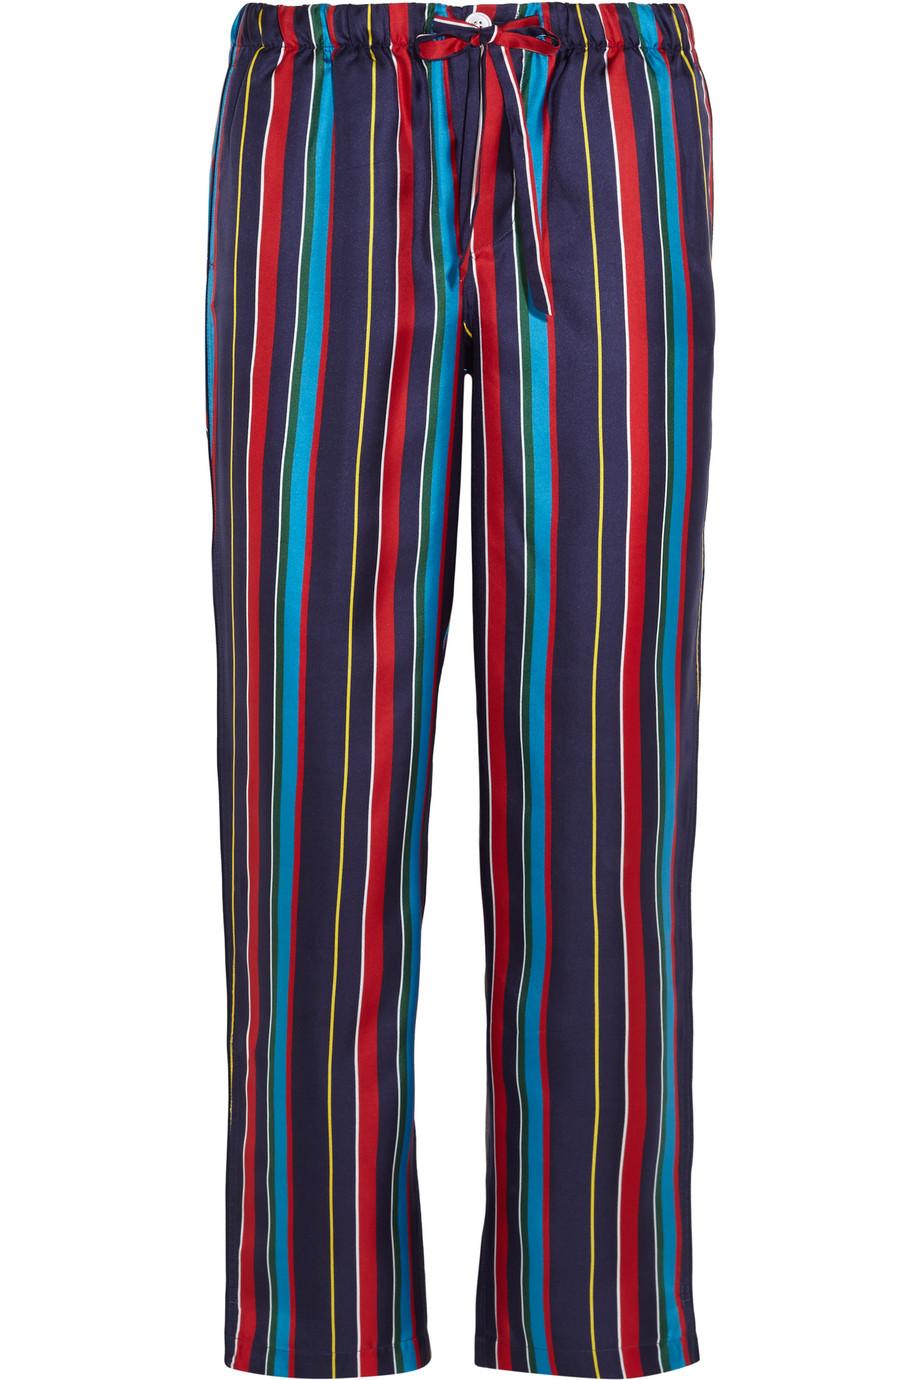 Marina Striped Silk-Charmeuse Pajama Pants, Royal Blue, Women's, Size: L